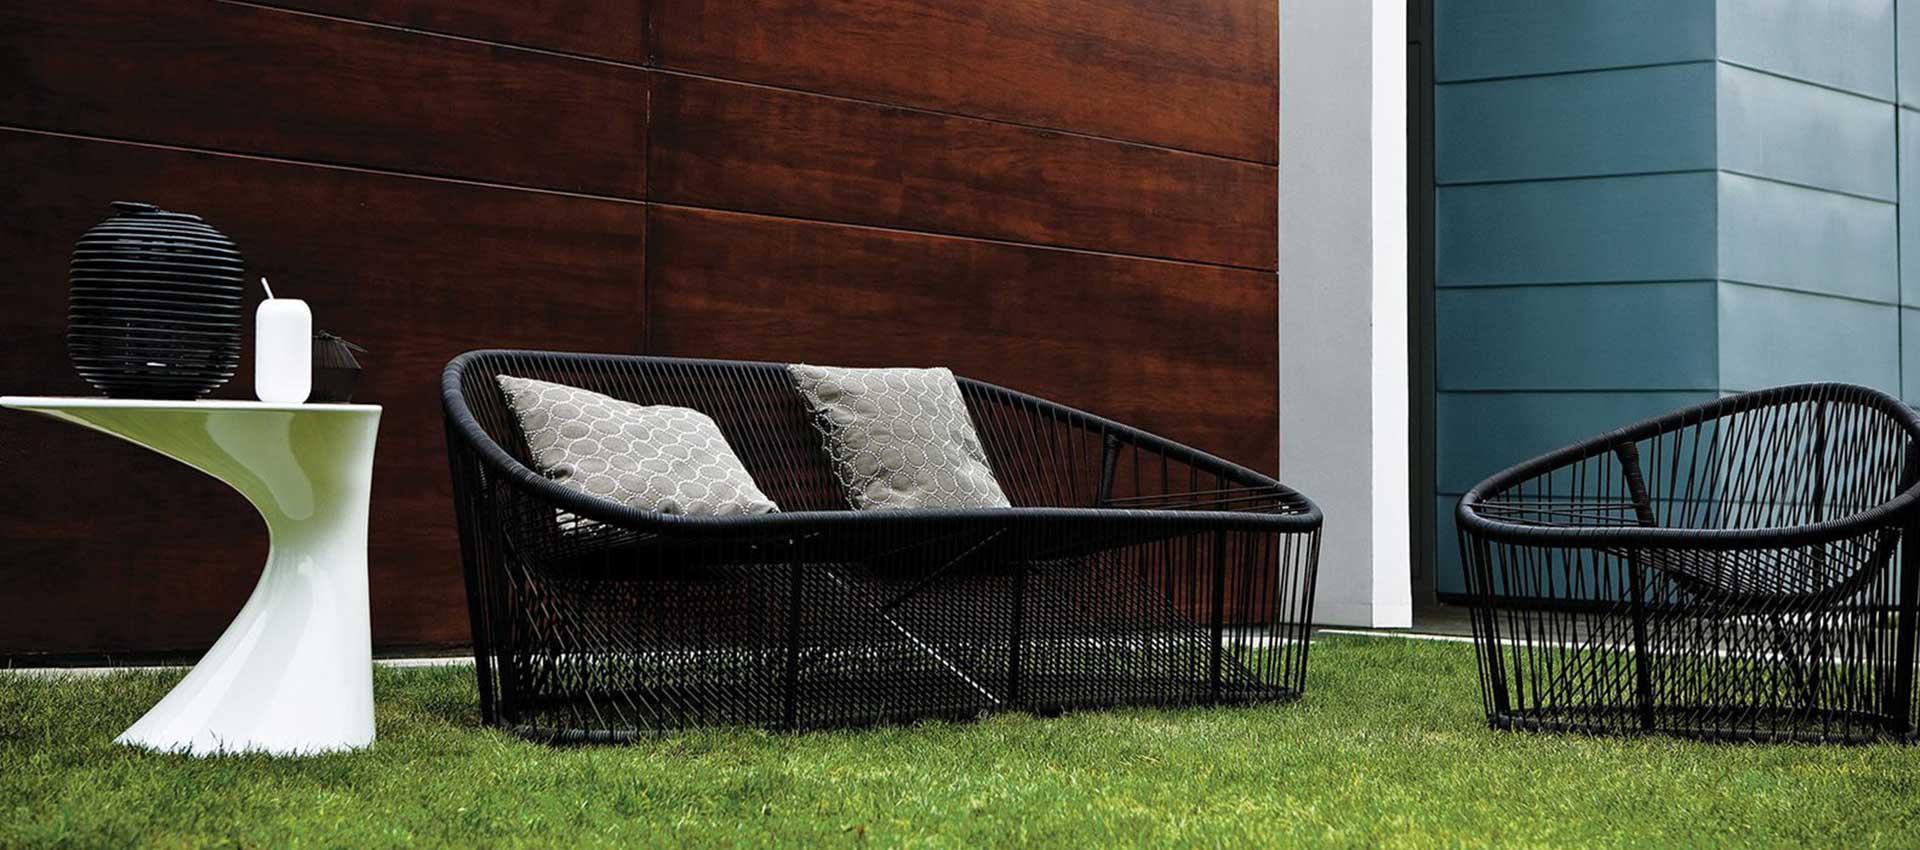 Awe Inspiring Outdoor Tagged Marc Krusin M2L Furniture Creativecarmelina Interior Chair Design Creativecarmelinacom